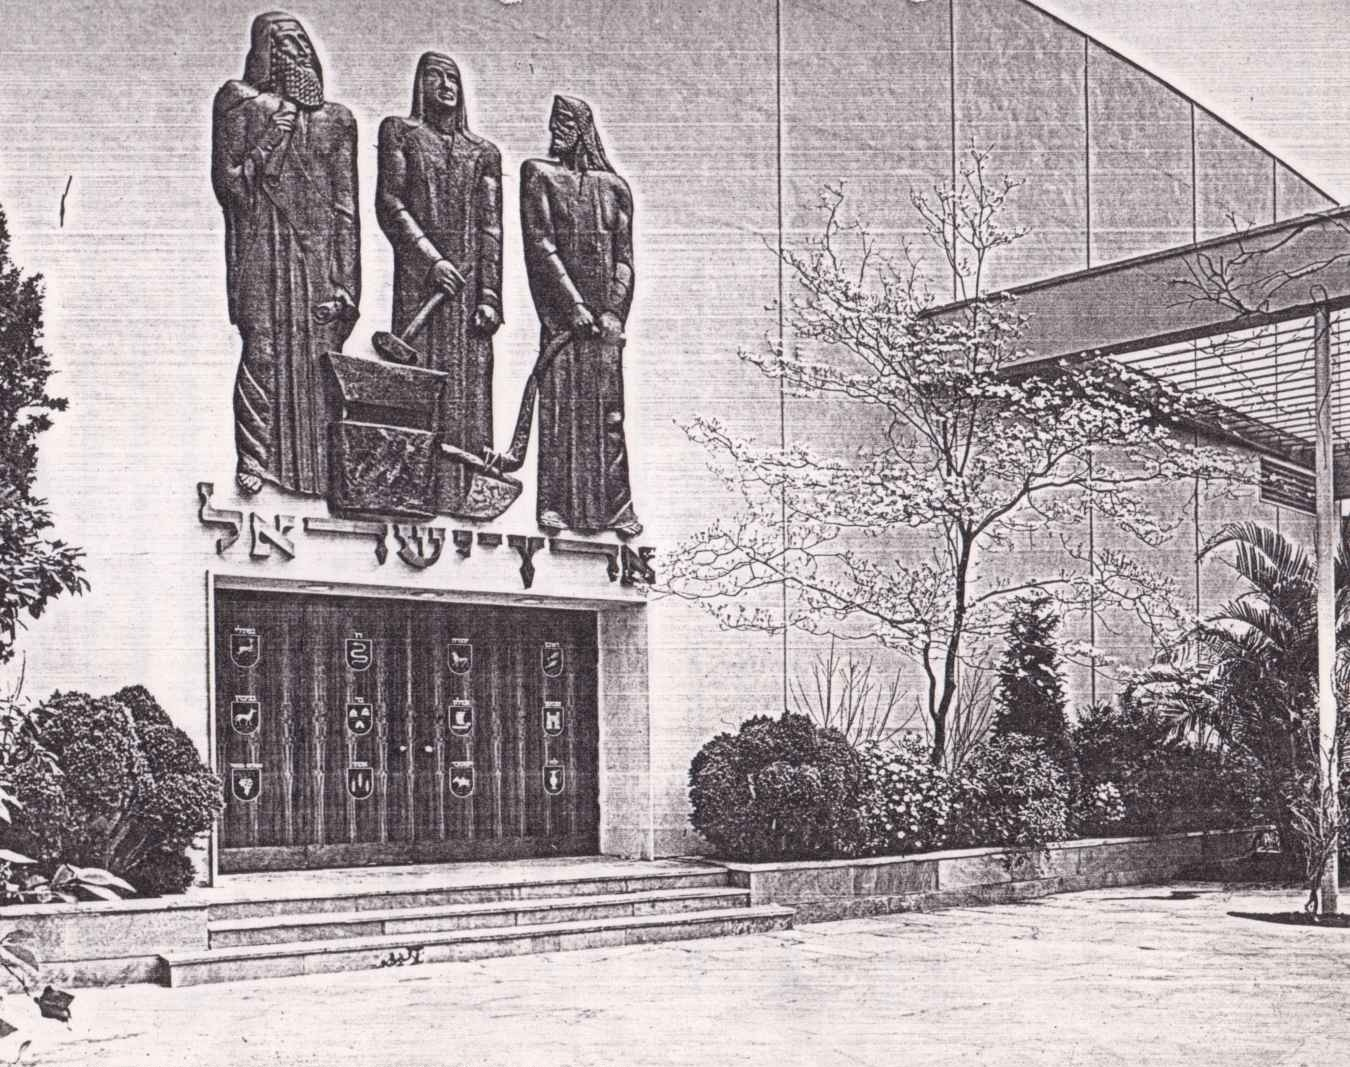 Maurice Ascalon 1939 New York Worlds Fair.jpg